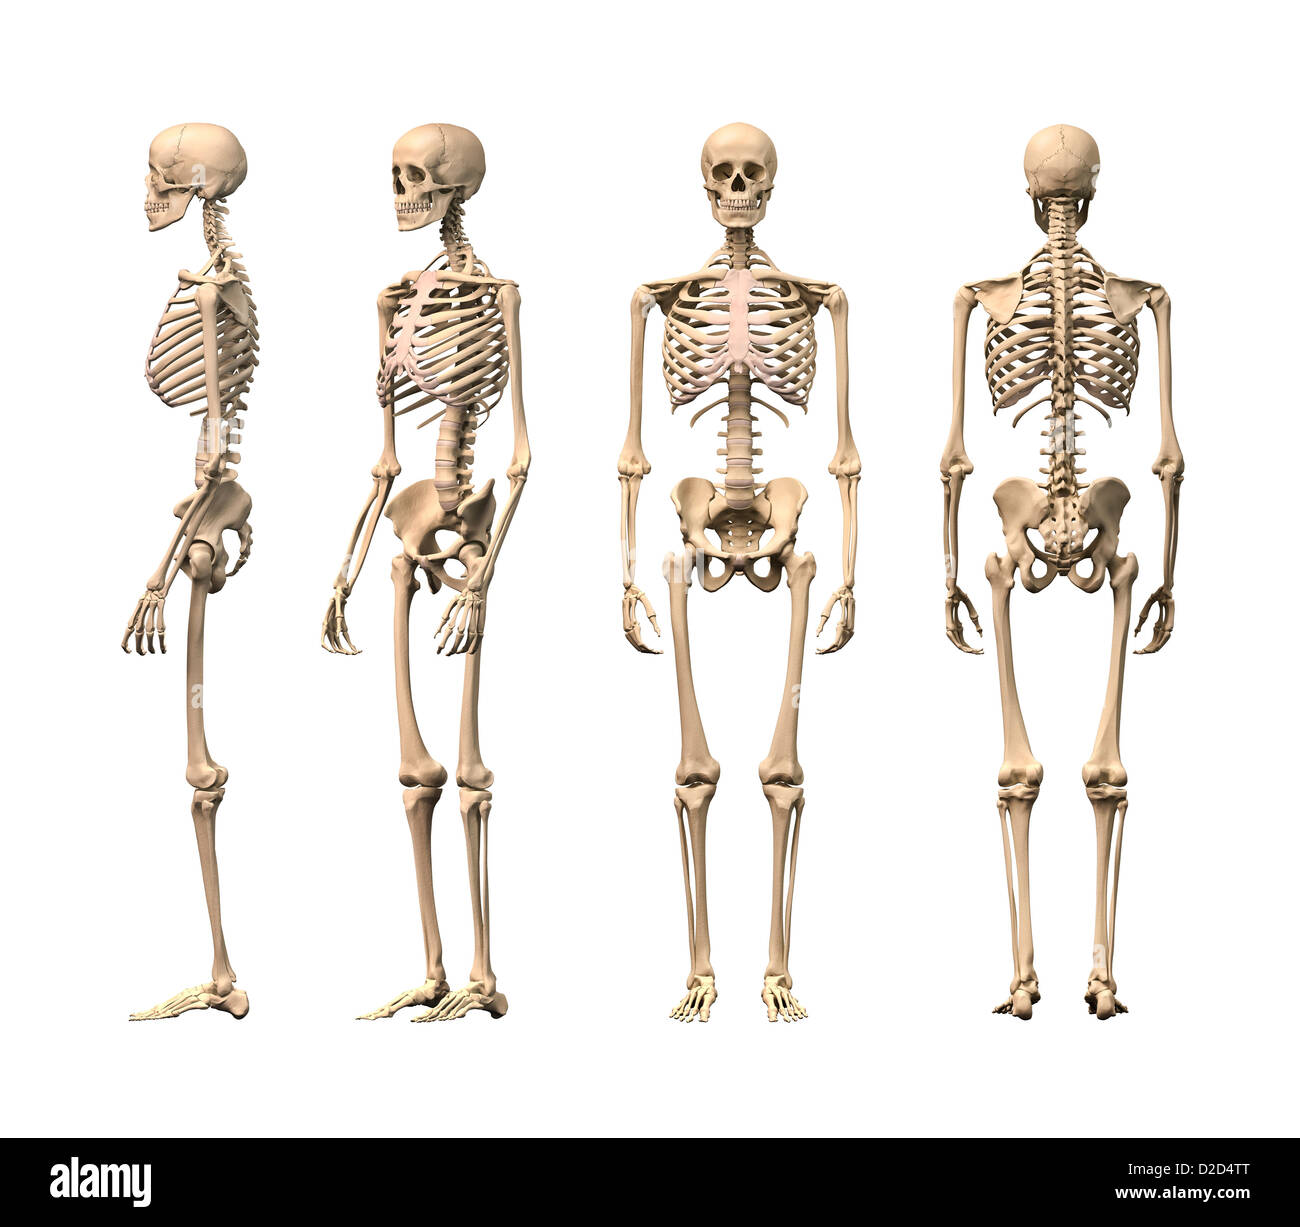 Menschliches Skelett Computer Grafik Stockbild